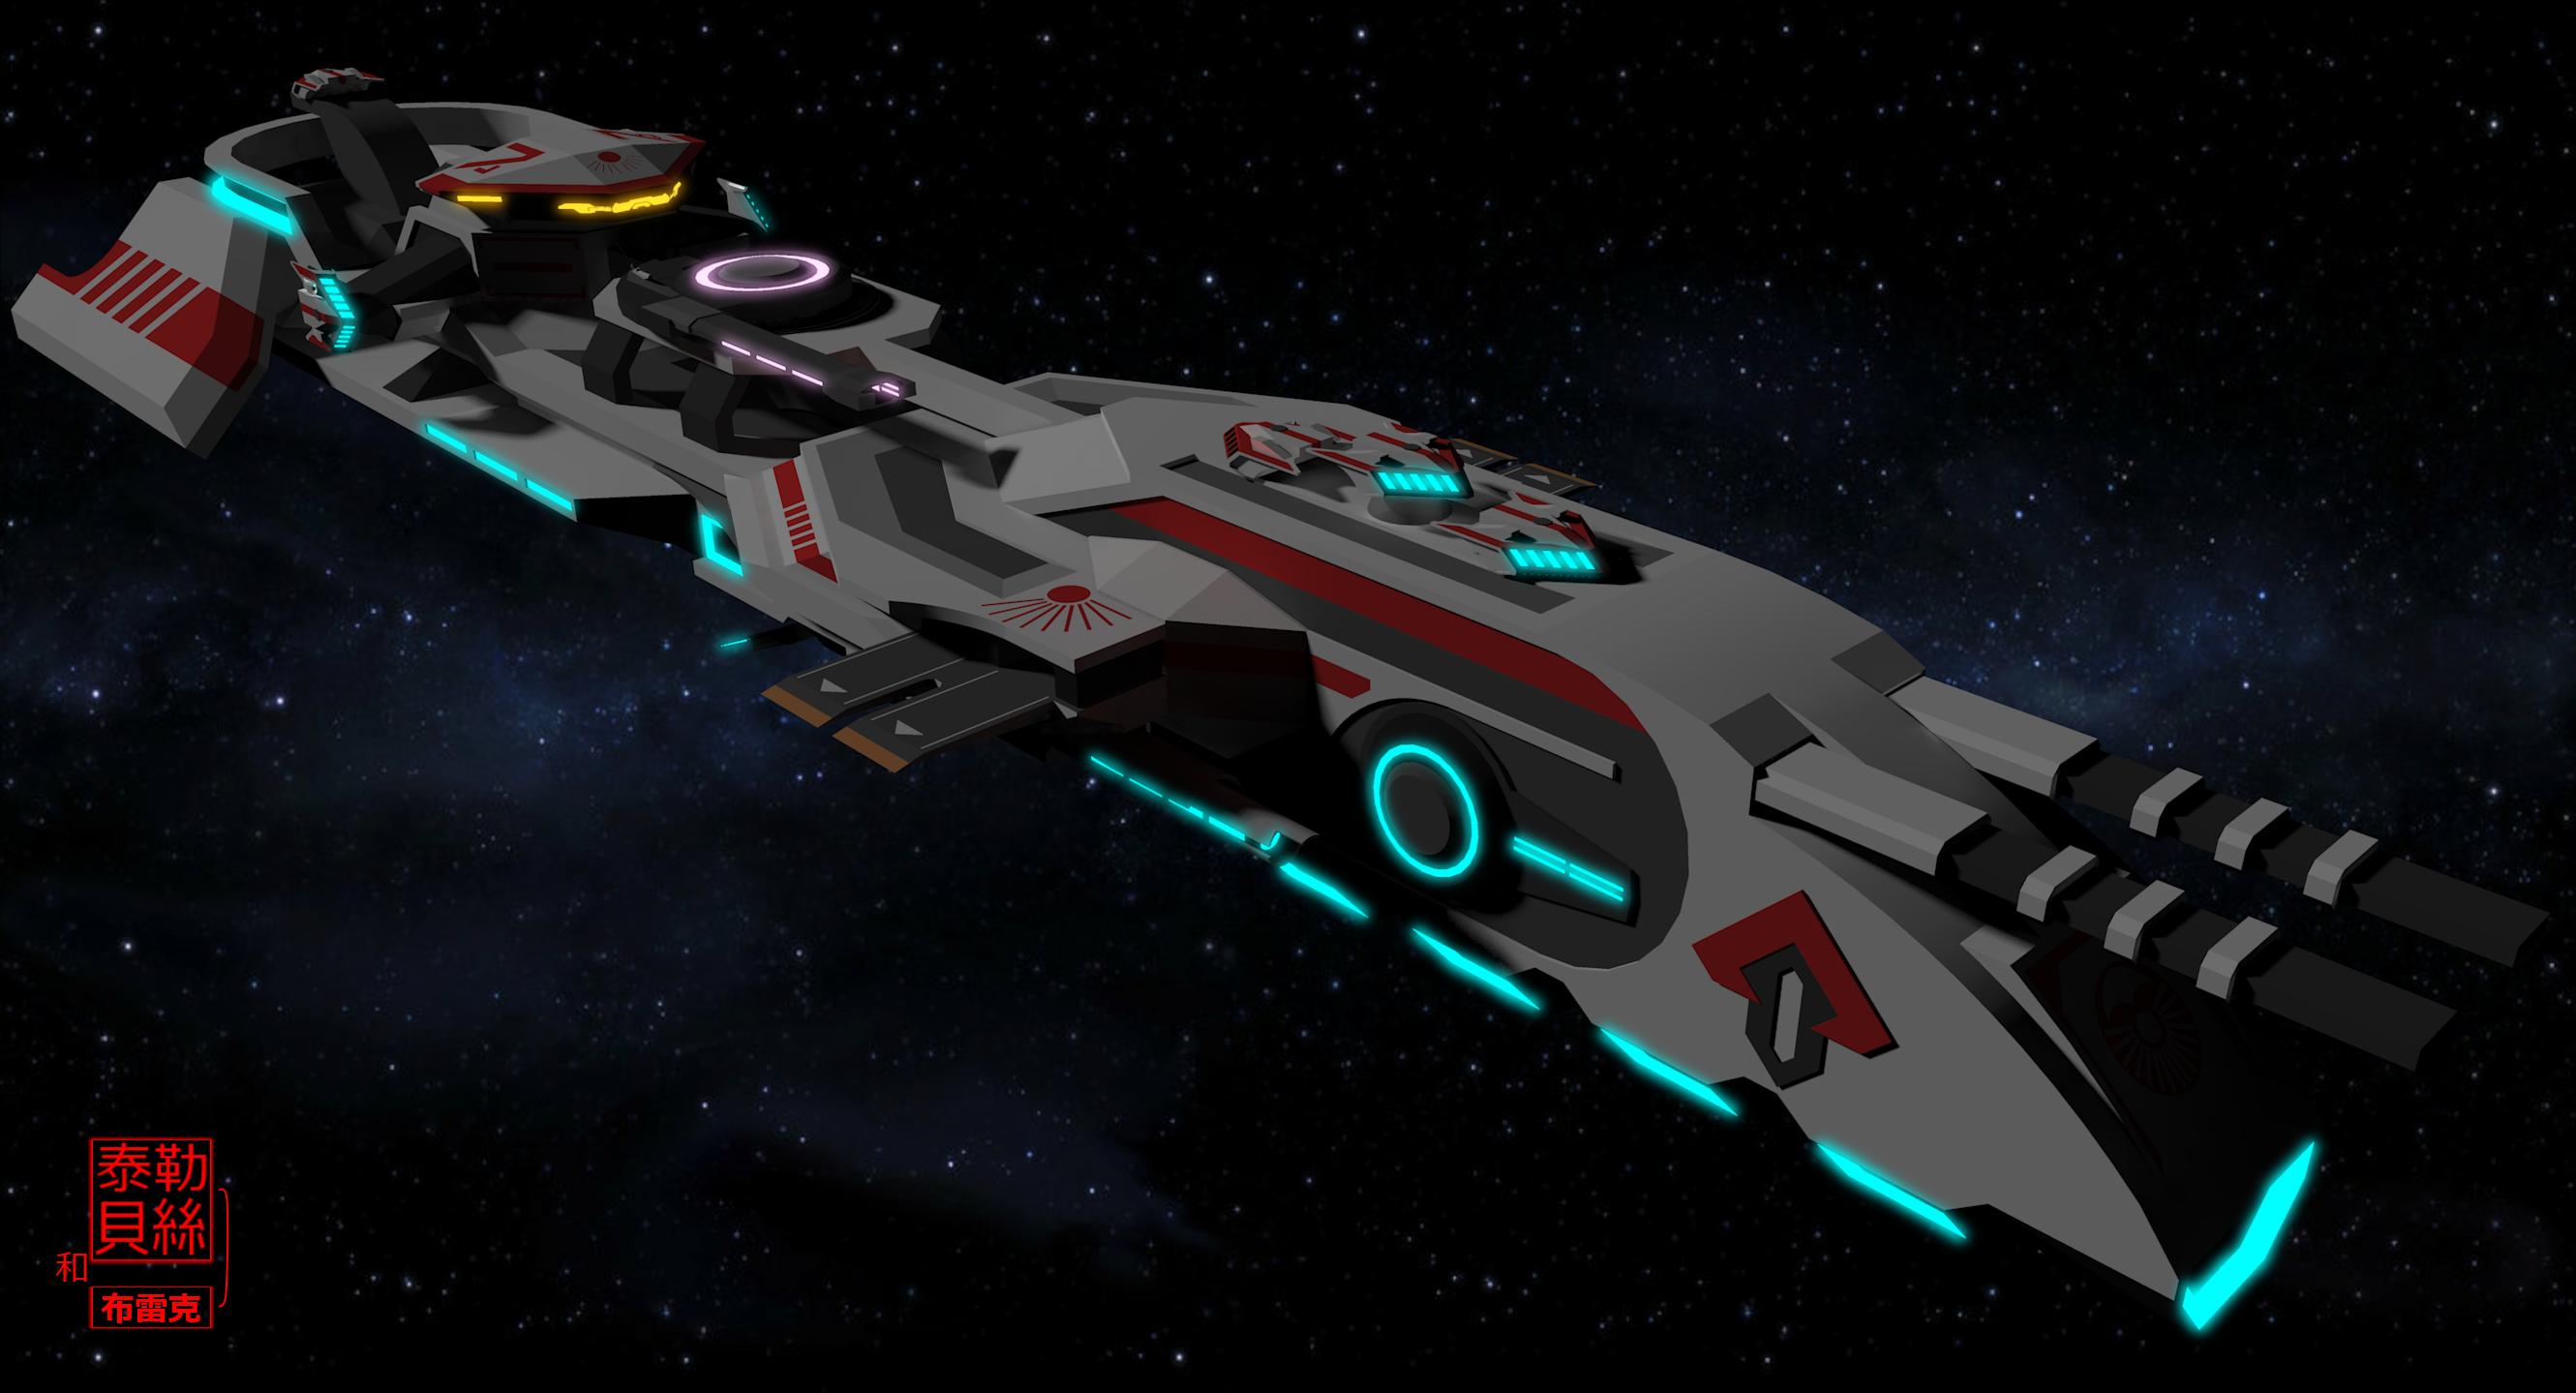 Gaidan Primarch Class Carrier [Aquarion] by Gwentari